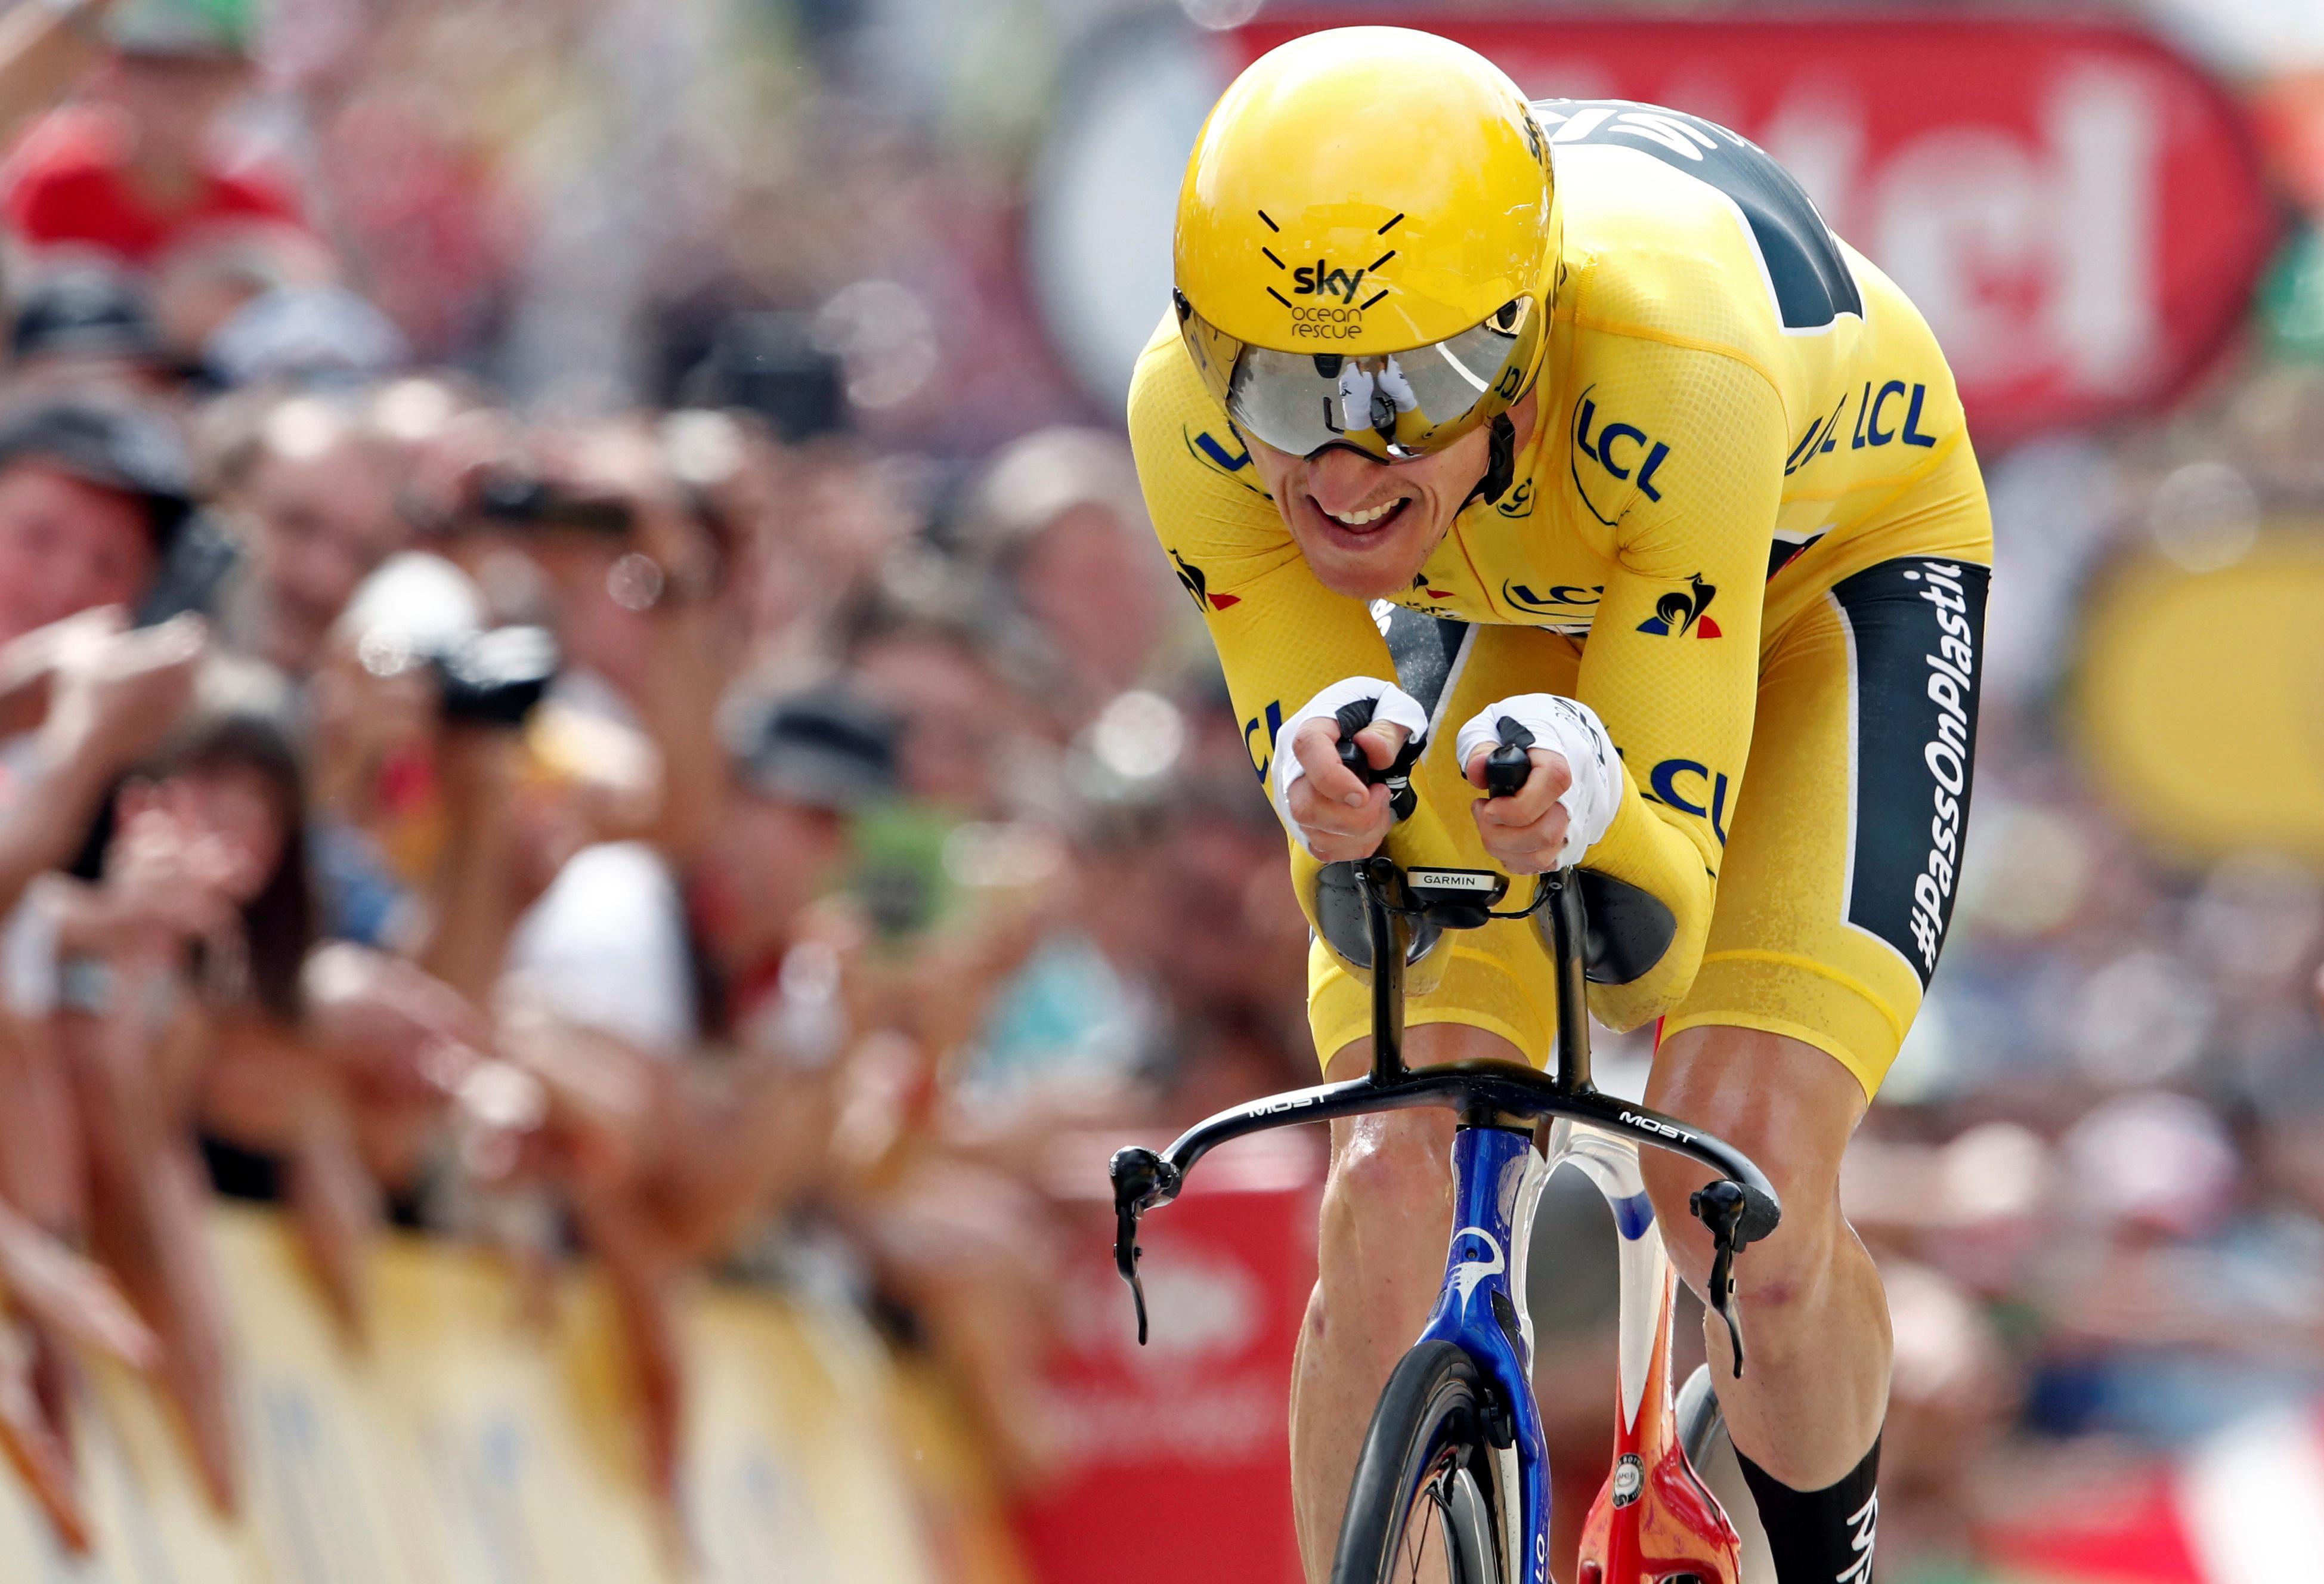 Cycling: Iconic yellow jersey celebrates 100th anniversary